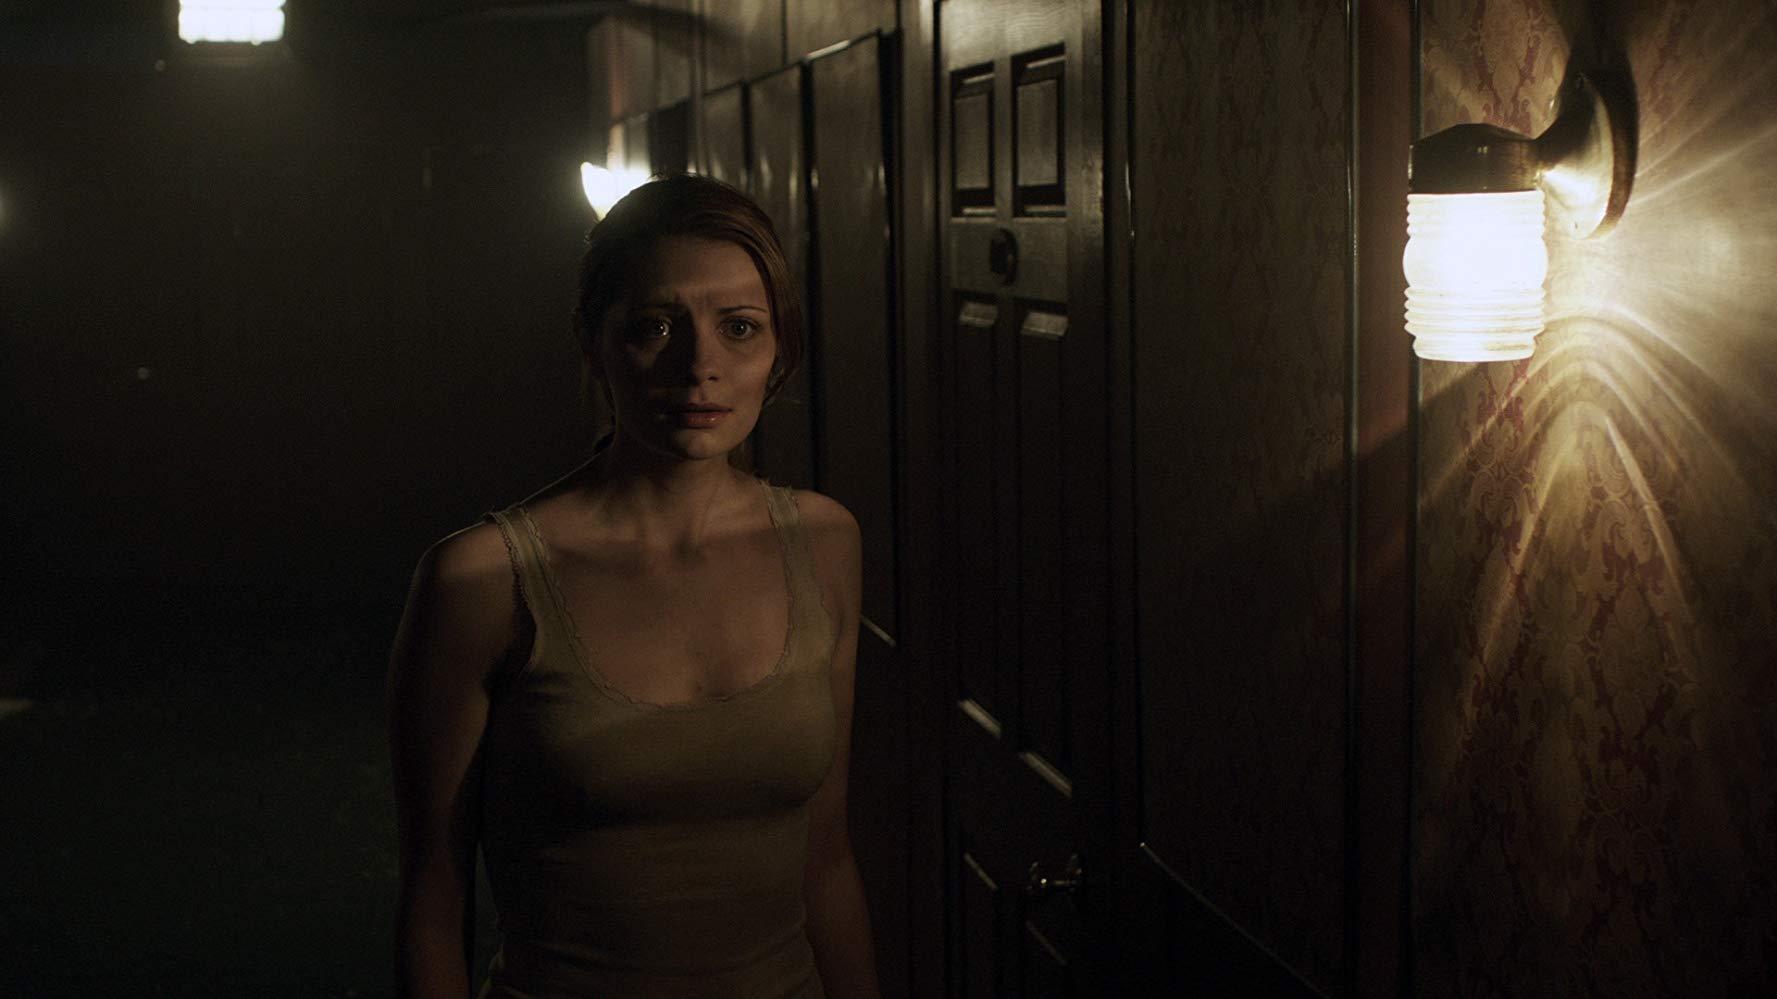 مشاهدة فيلم I Will Follow You Into The Dark 2012 HD مترجم كامل اون لاين